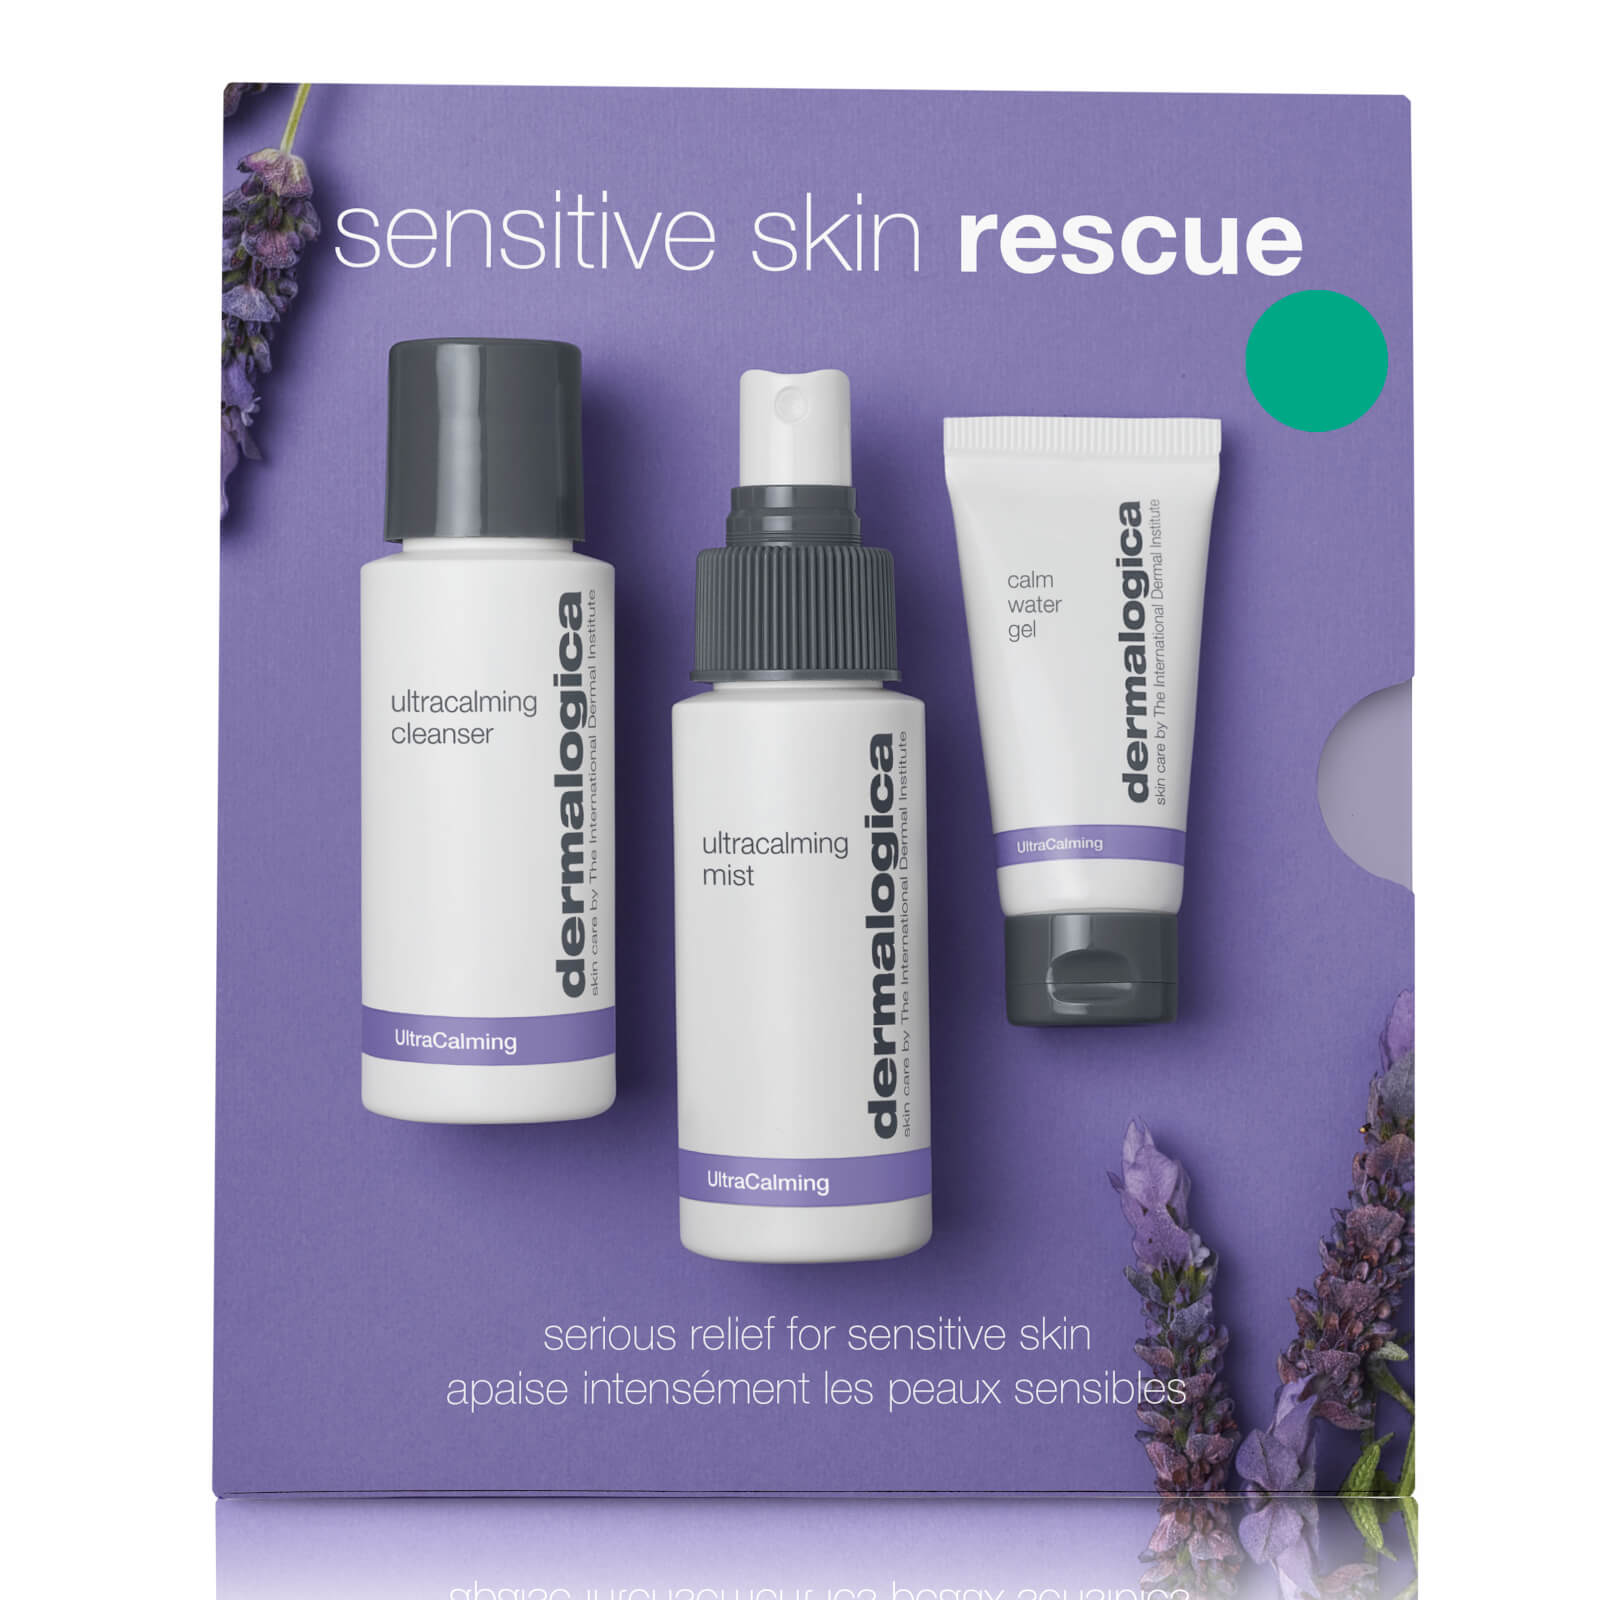 Купить Dermalogica Sensitive Skin Rescue Kit